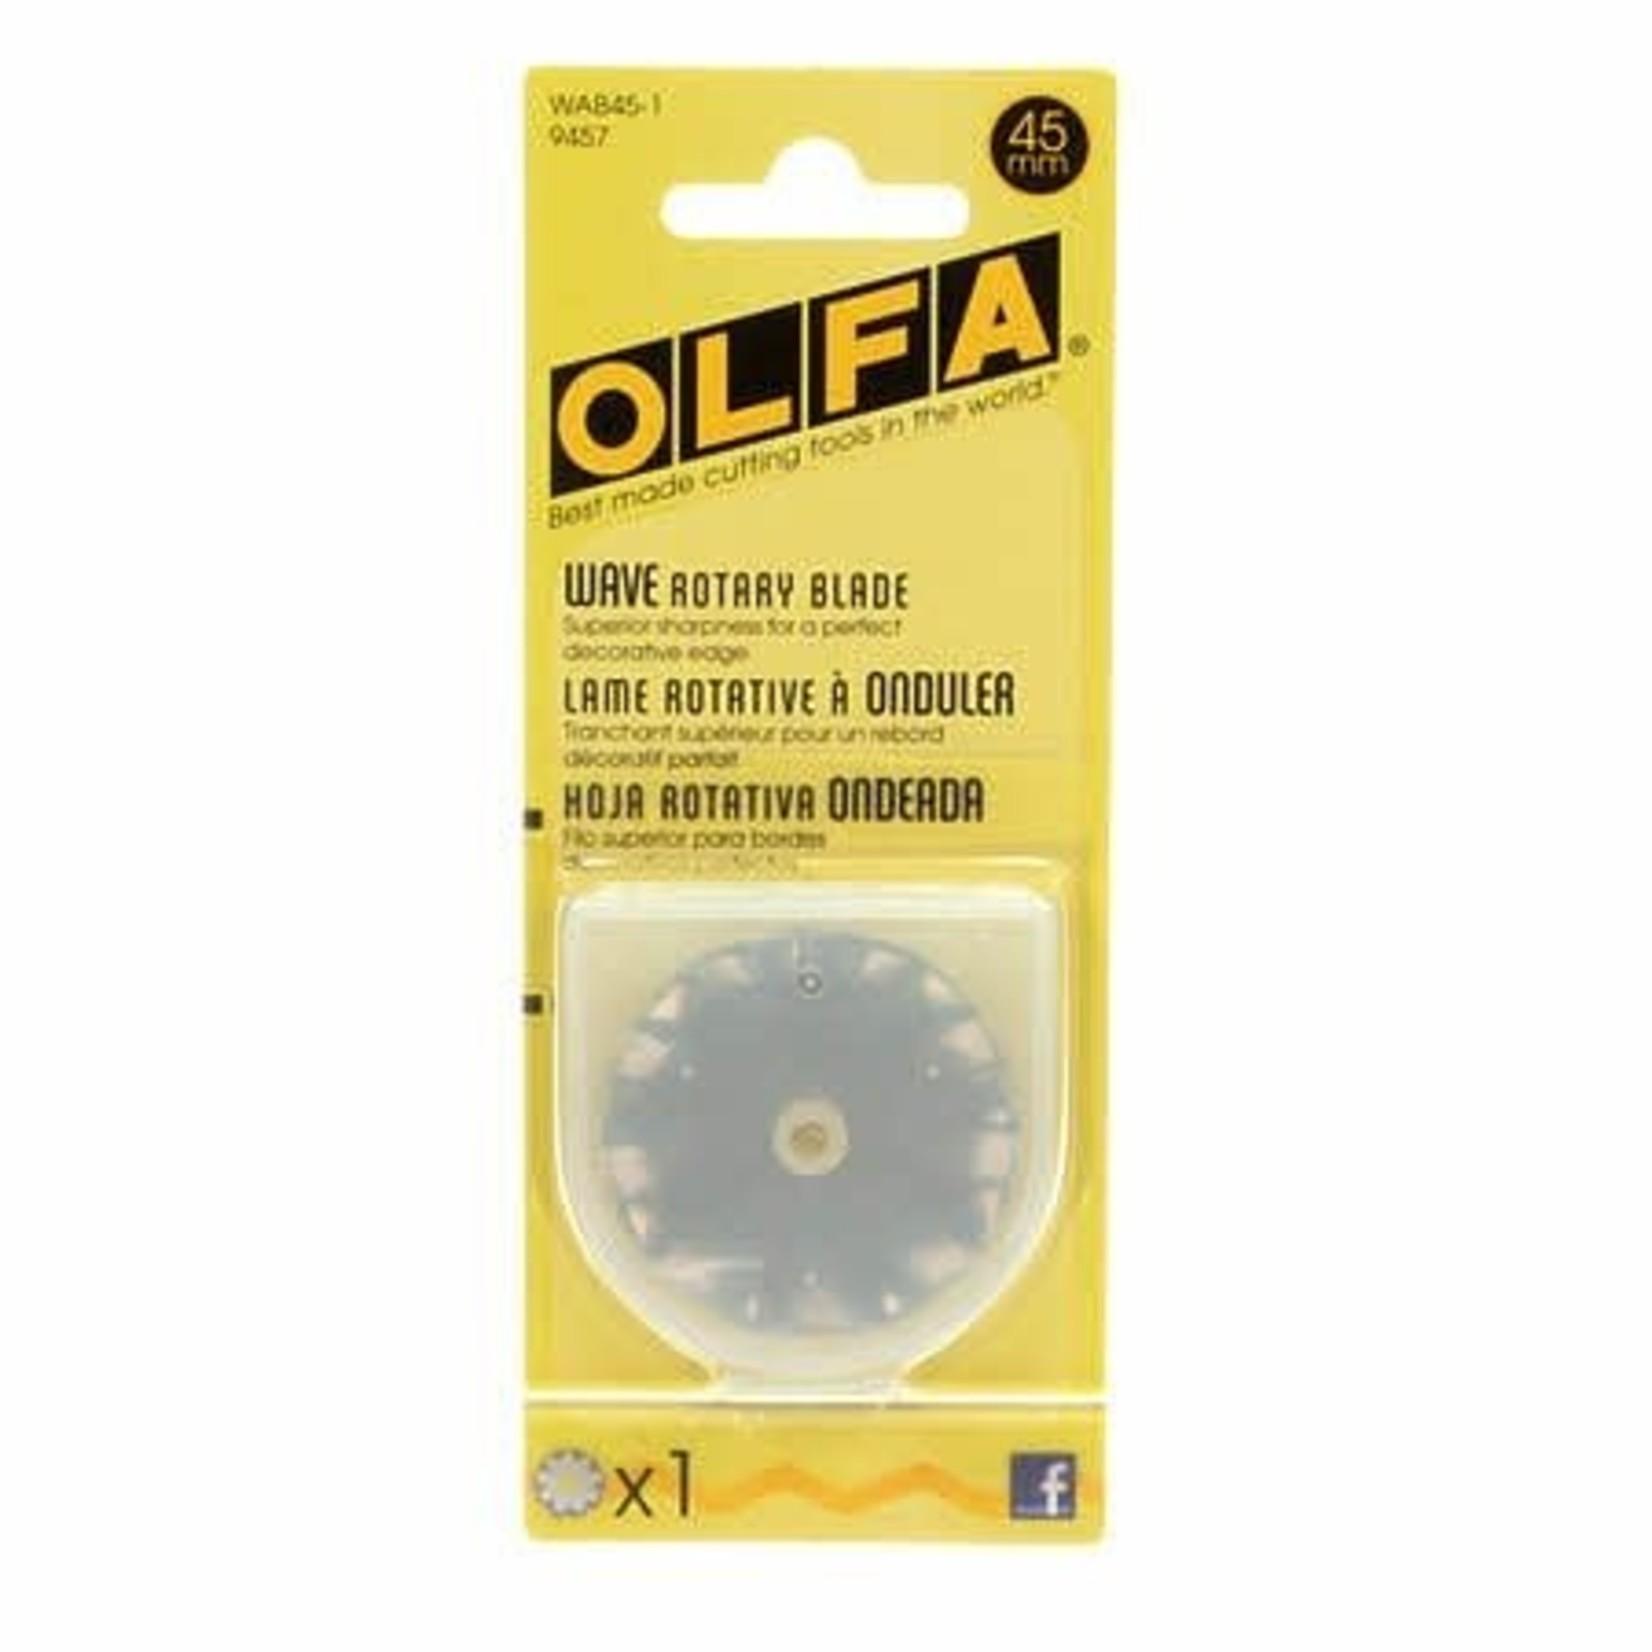 Olfa OLFA WAVE ROTARY BLADE 45MM